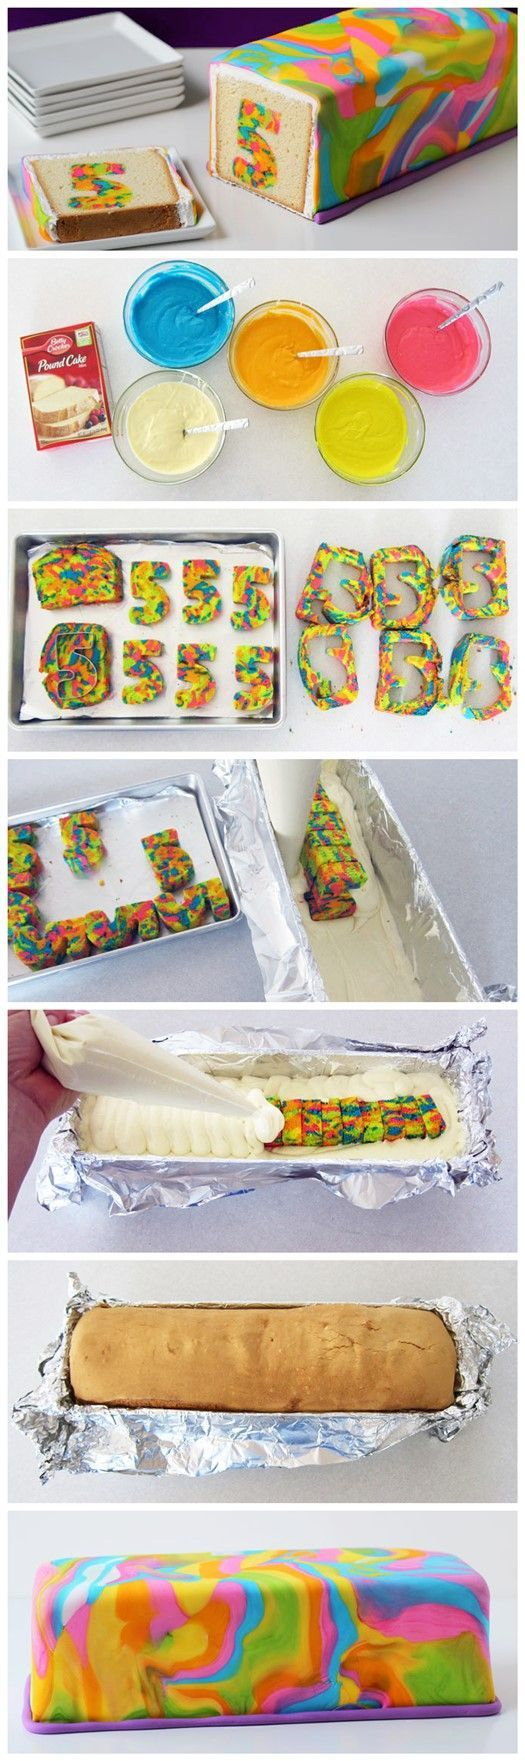 DIY Rainbow Tie Dye Surprise Cake Tutorial 2